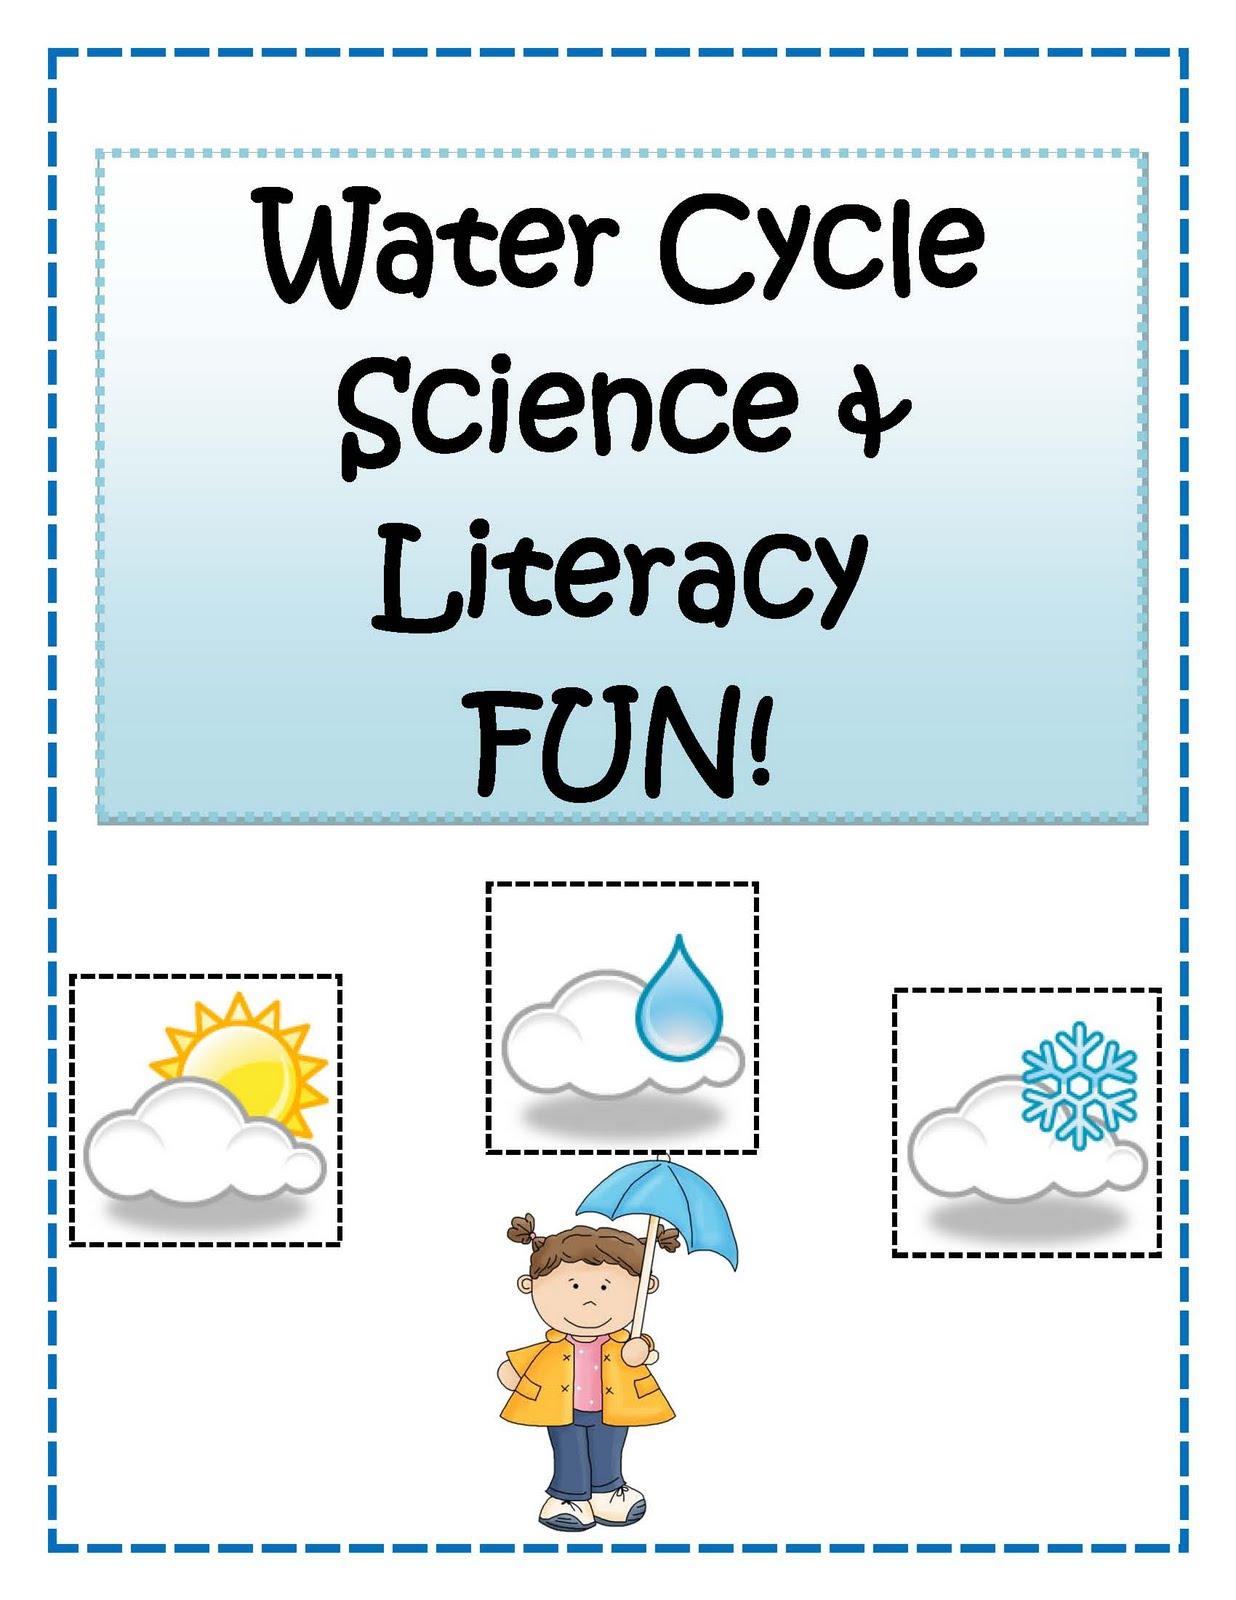 Little Miss Middle School Middle School Science Water ...